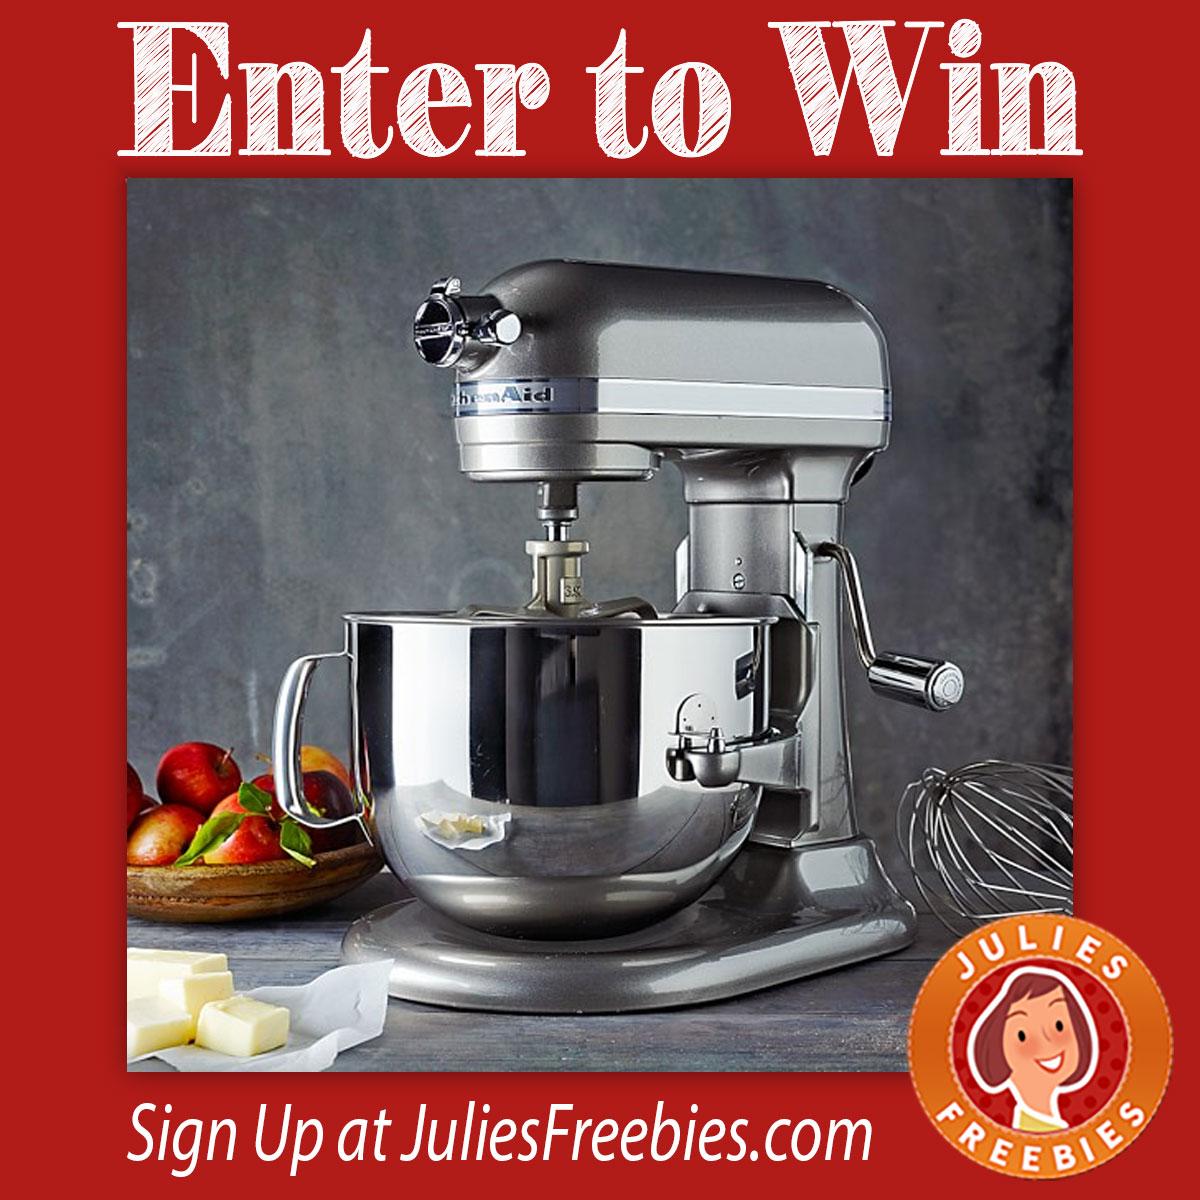 Uncategorized Kitchen Appliance Sweepstakes baking essentials sweepstakes julies freebies kitchenaidpromixer